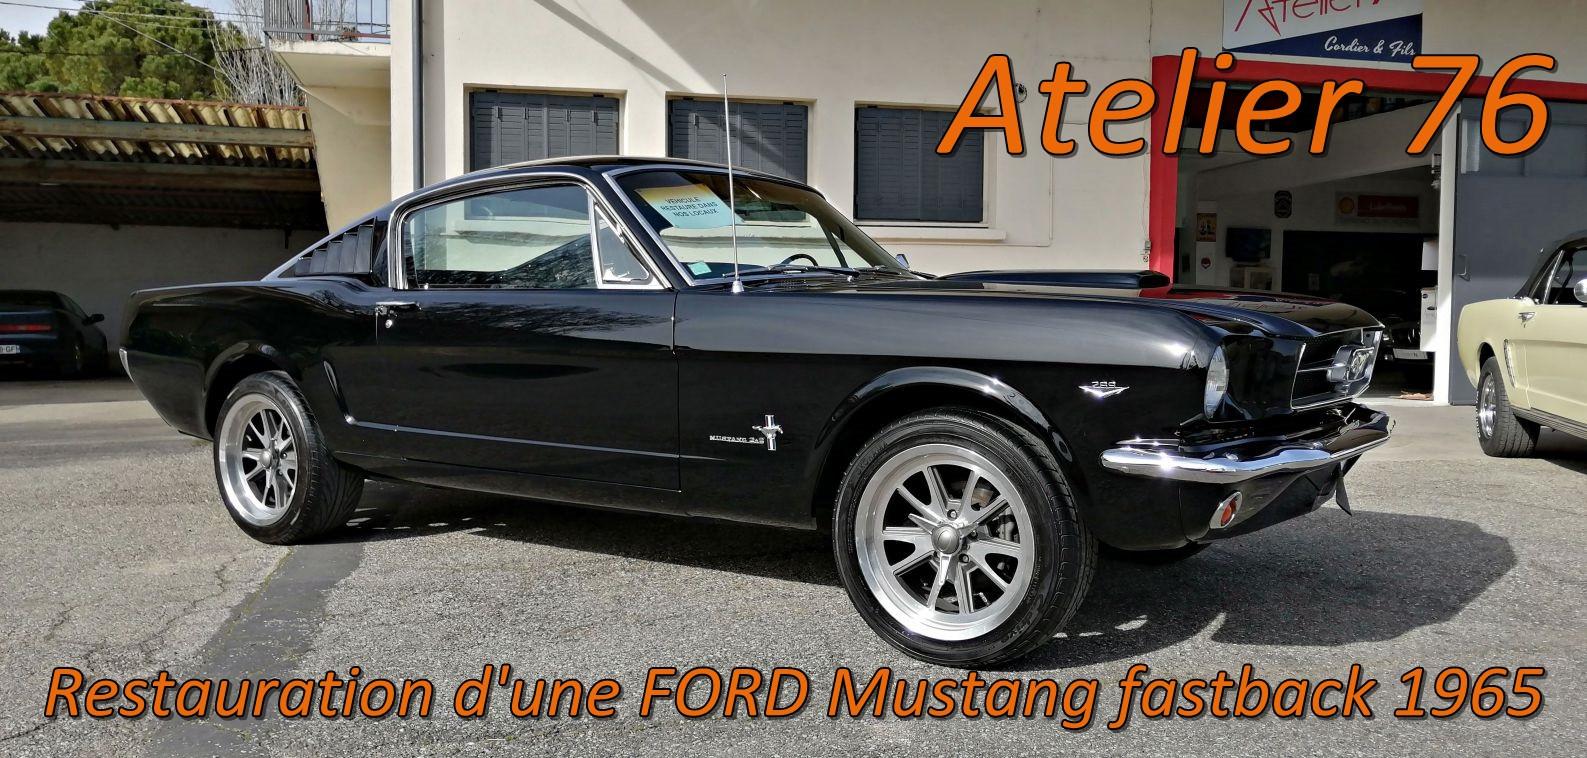 FORD Mustang fastback 1965 restaurée chez Atelier 76